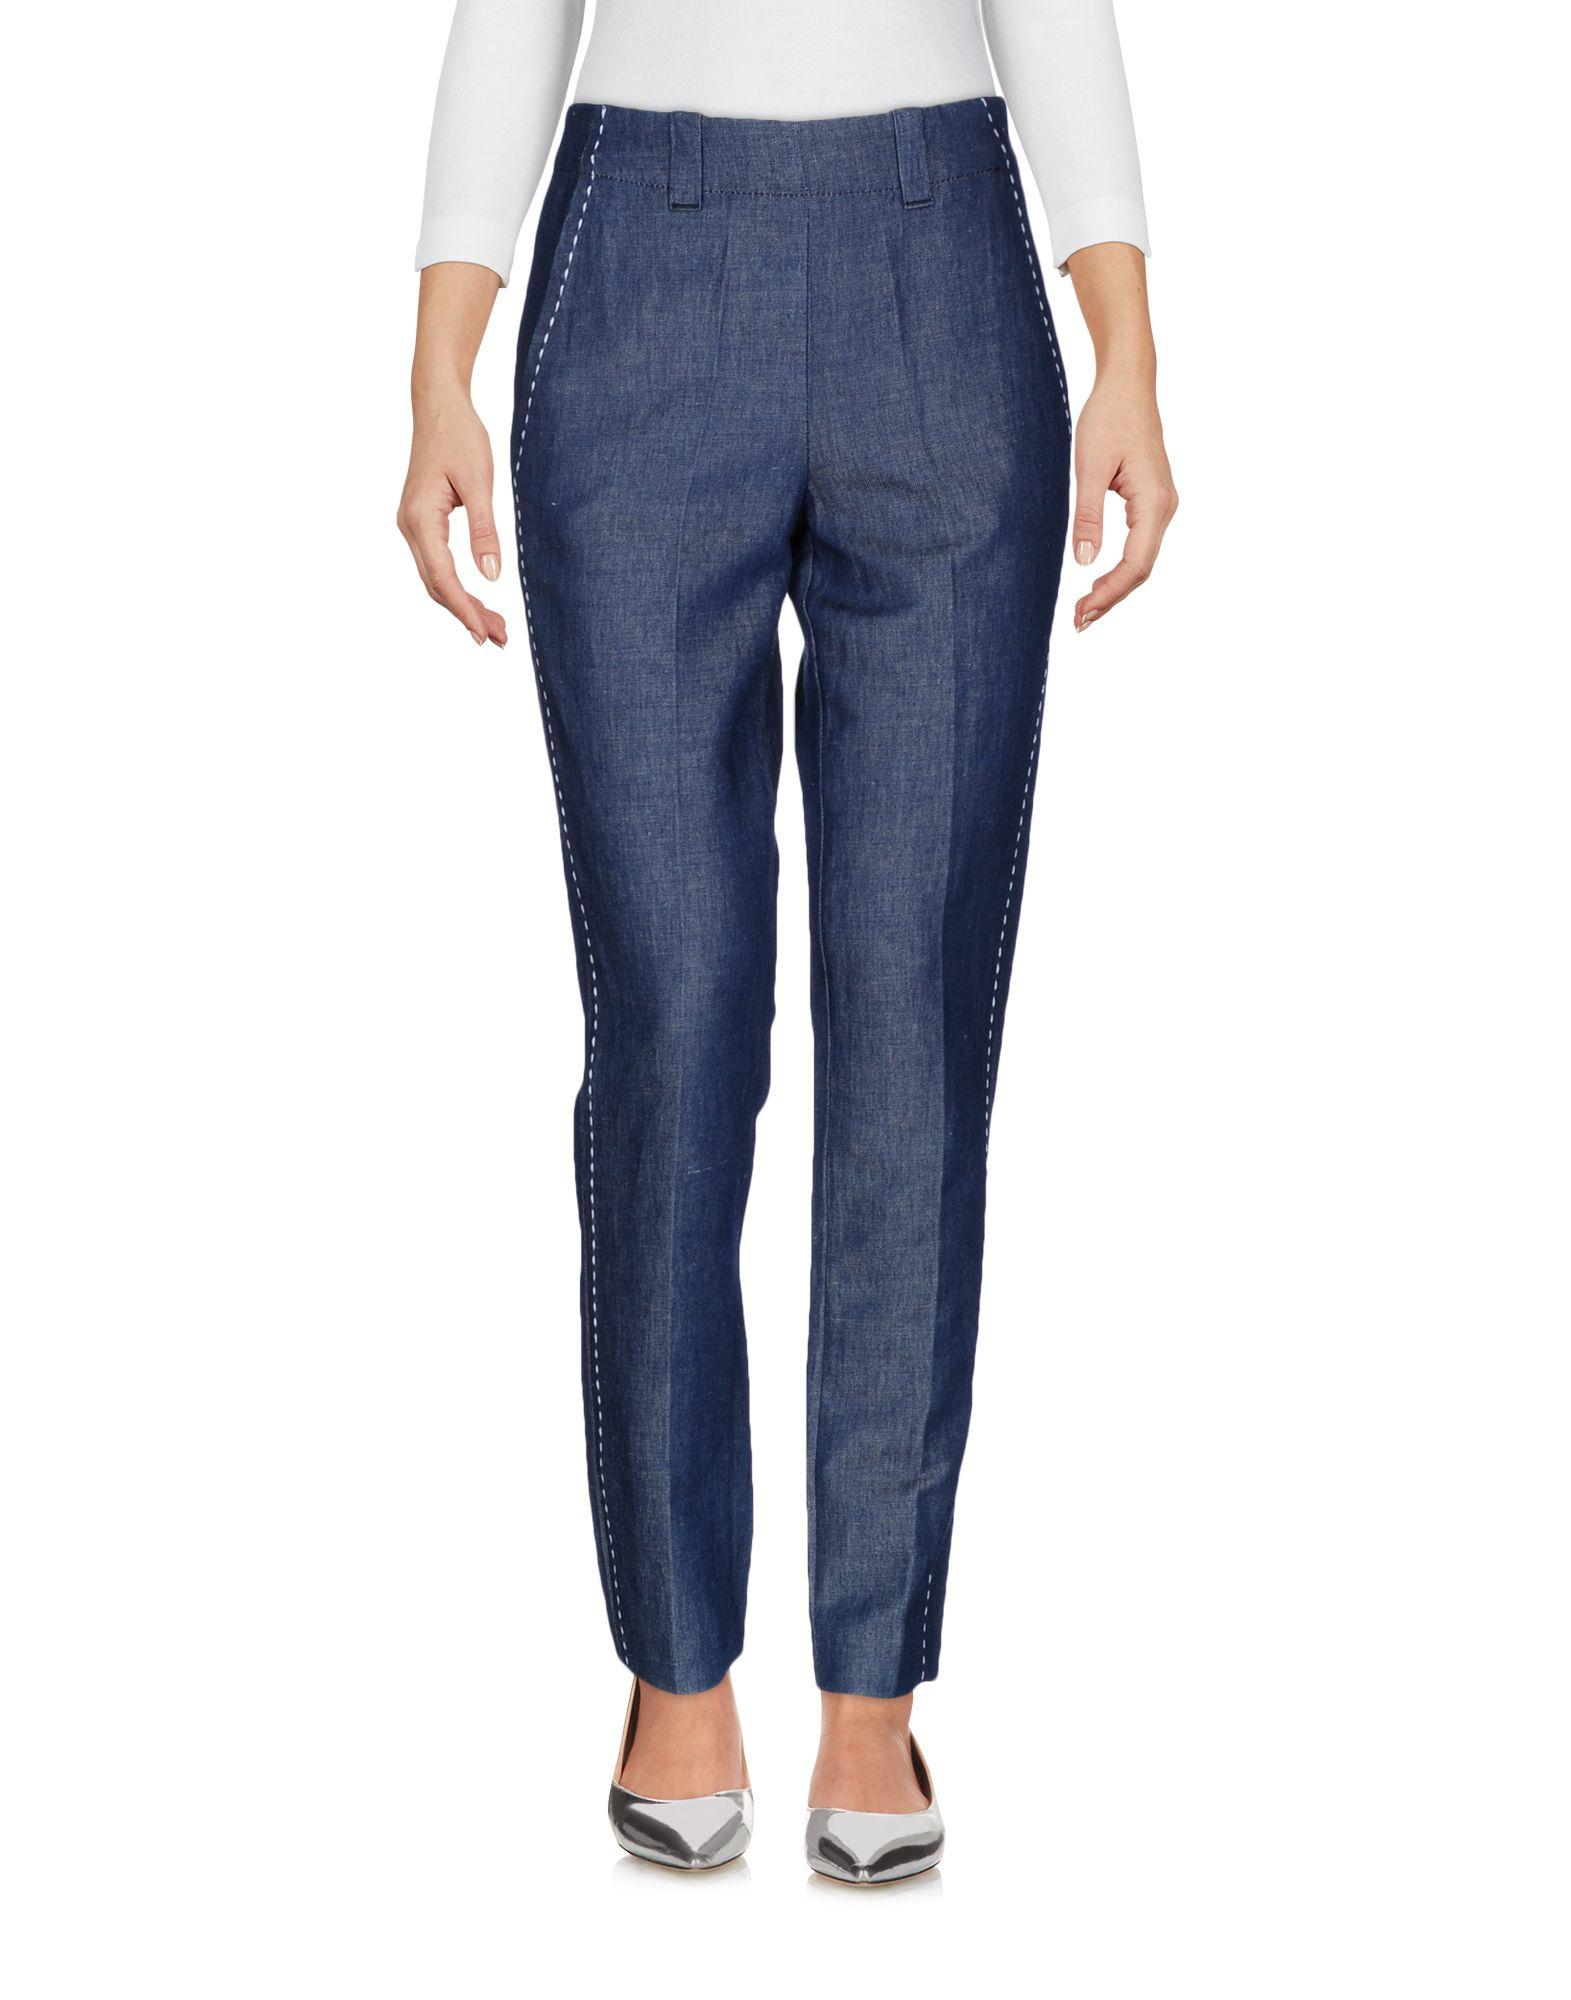 Pantaloni Jeans Dondup Donna - Acquista online su JErzuM2x